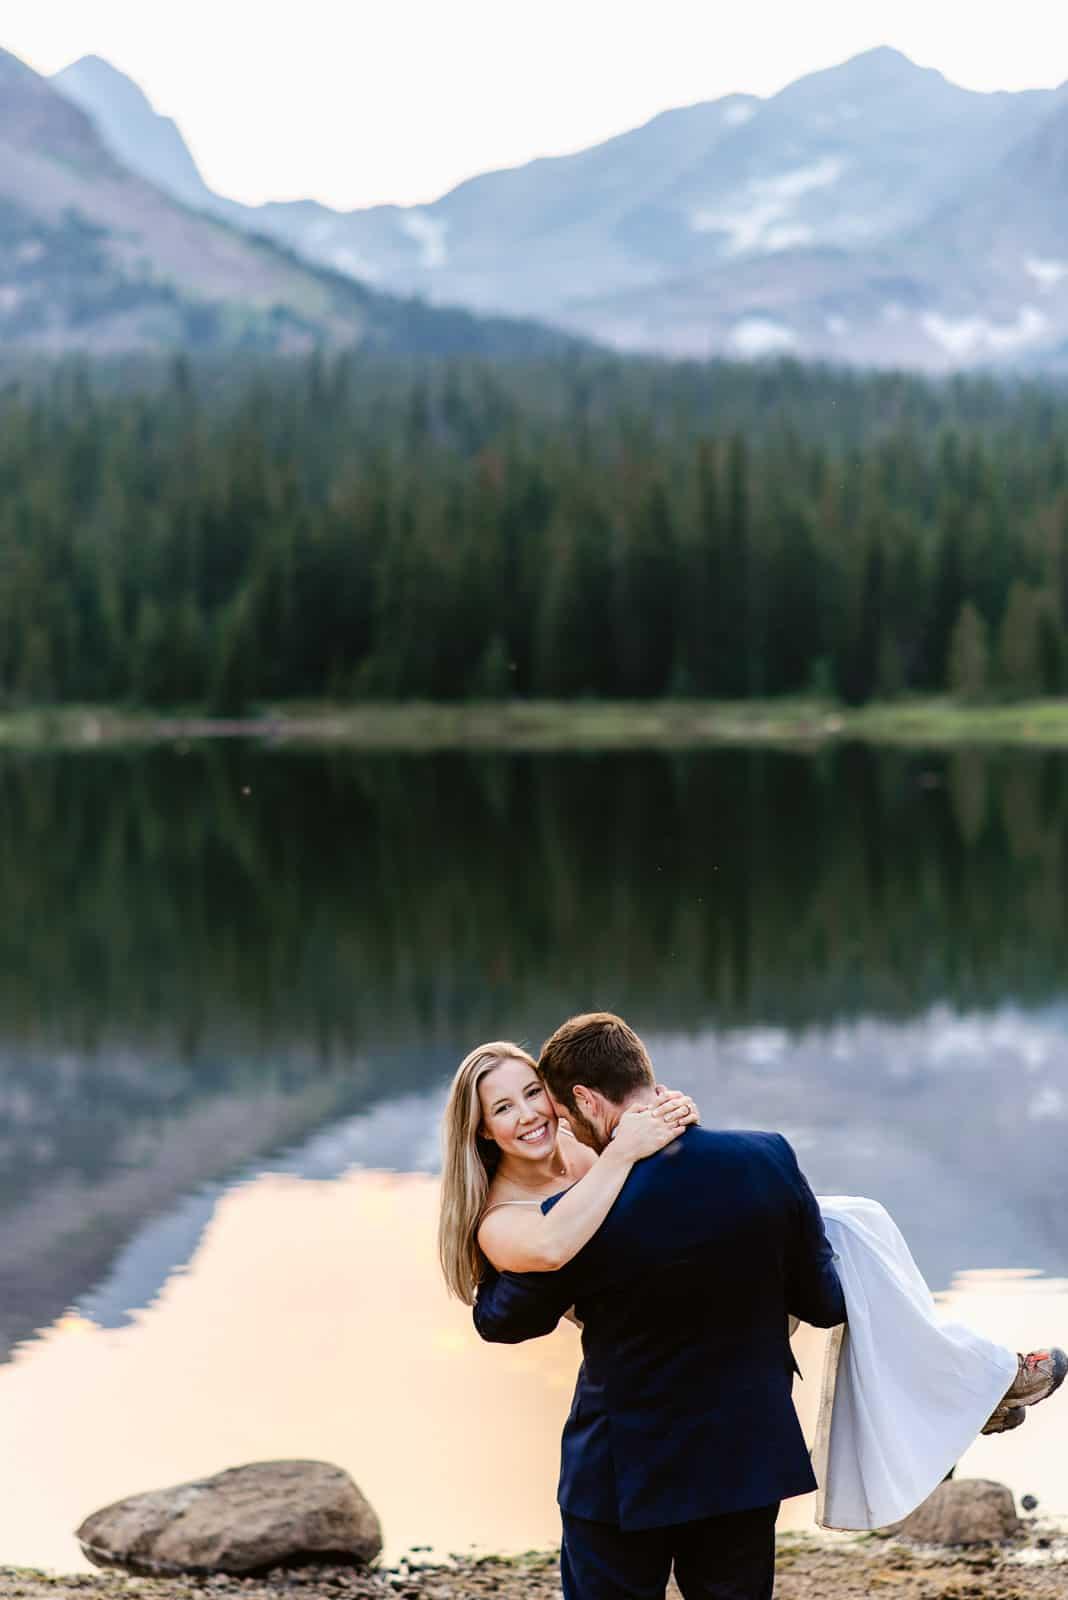 Colorado Elopement Ideas | Josie V Photography